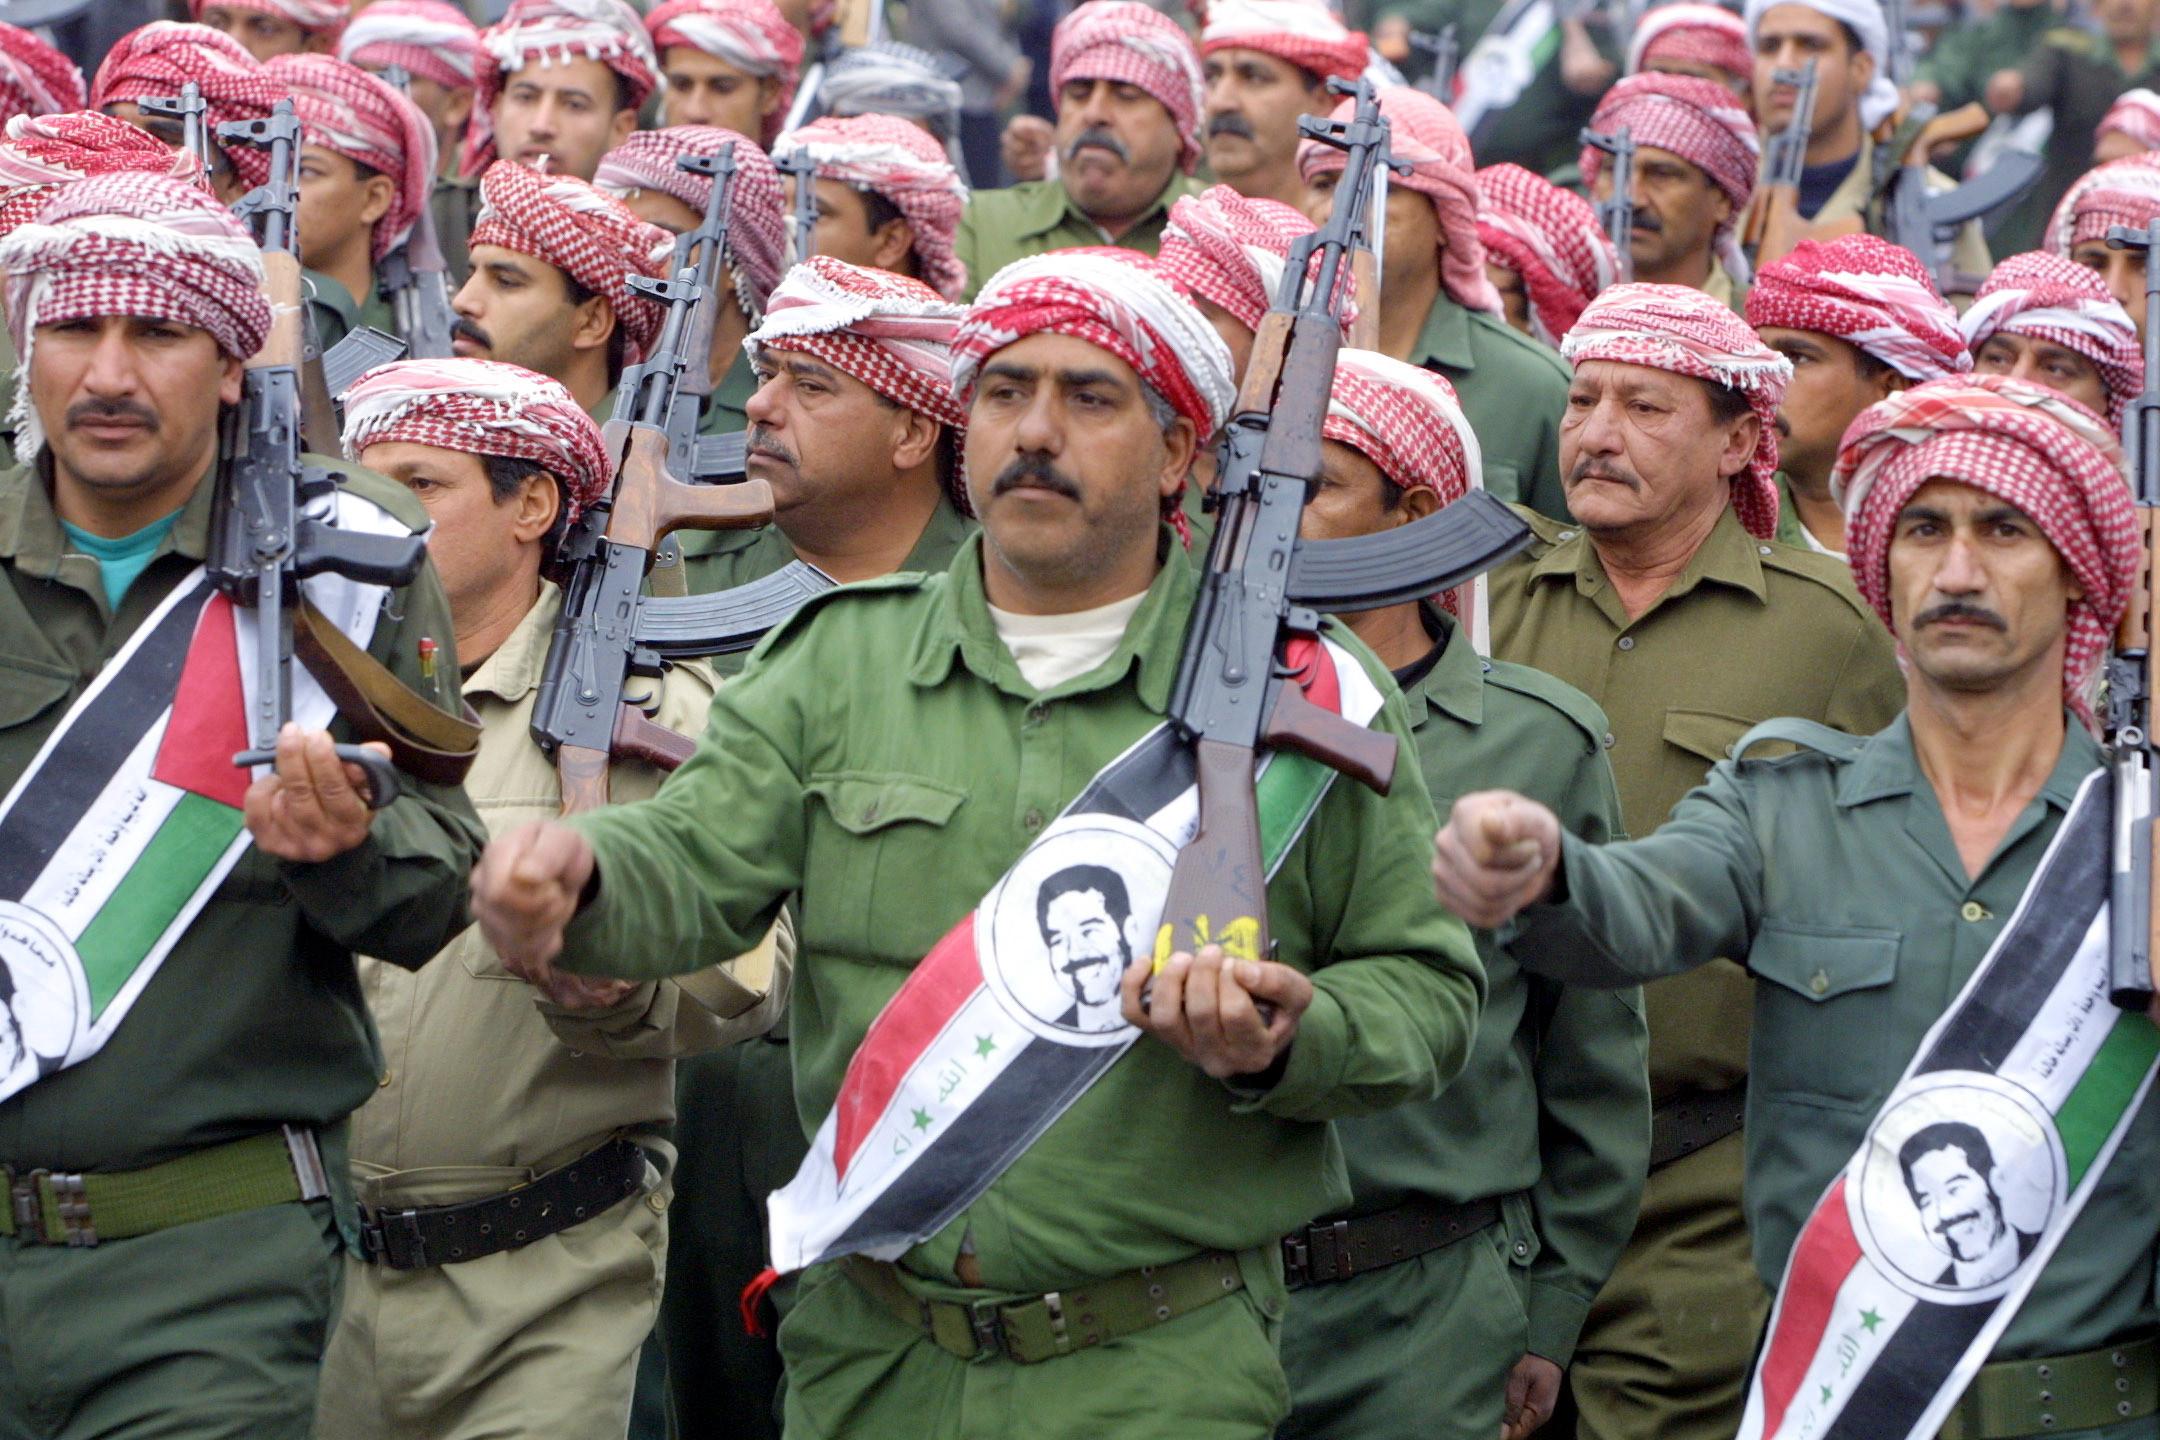 baath party flag iraq saddam